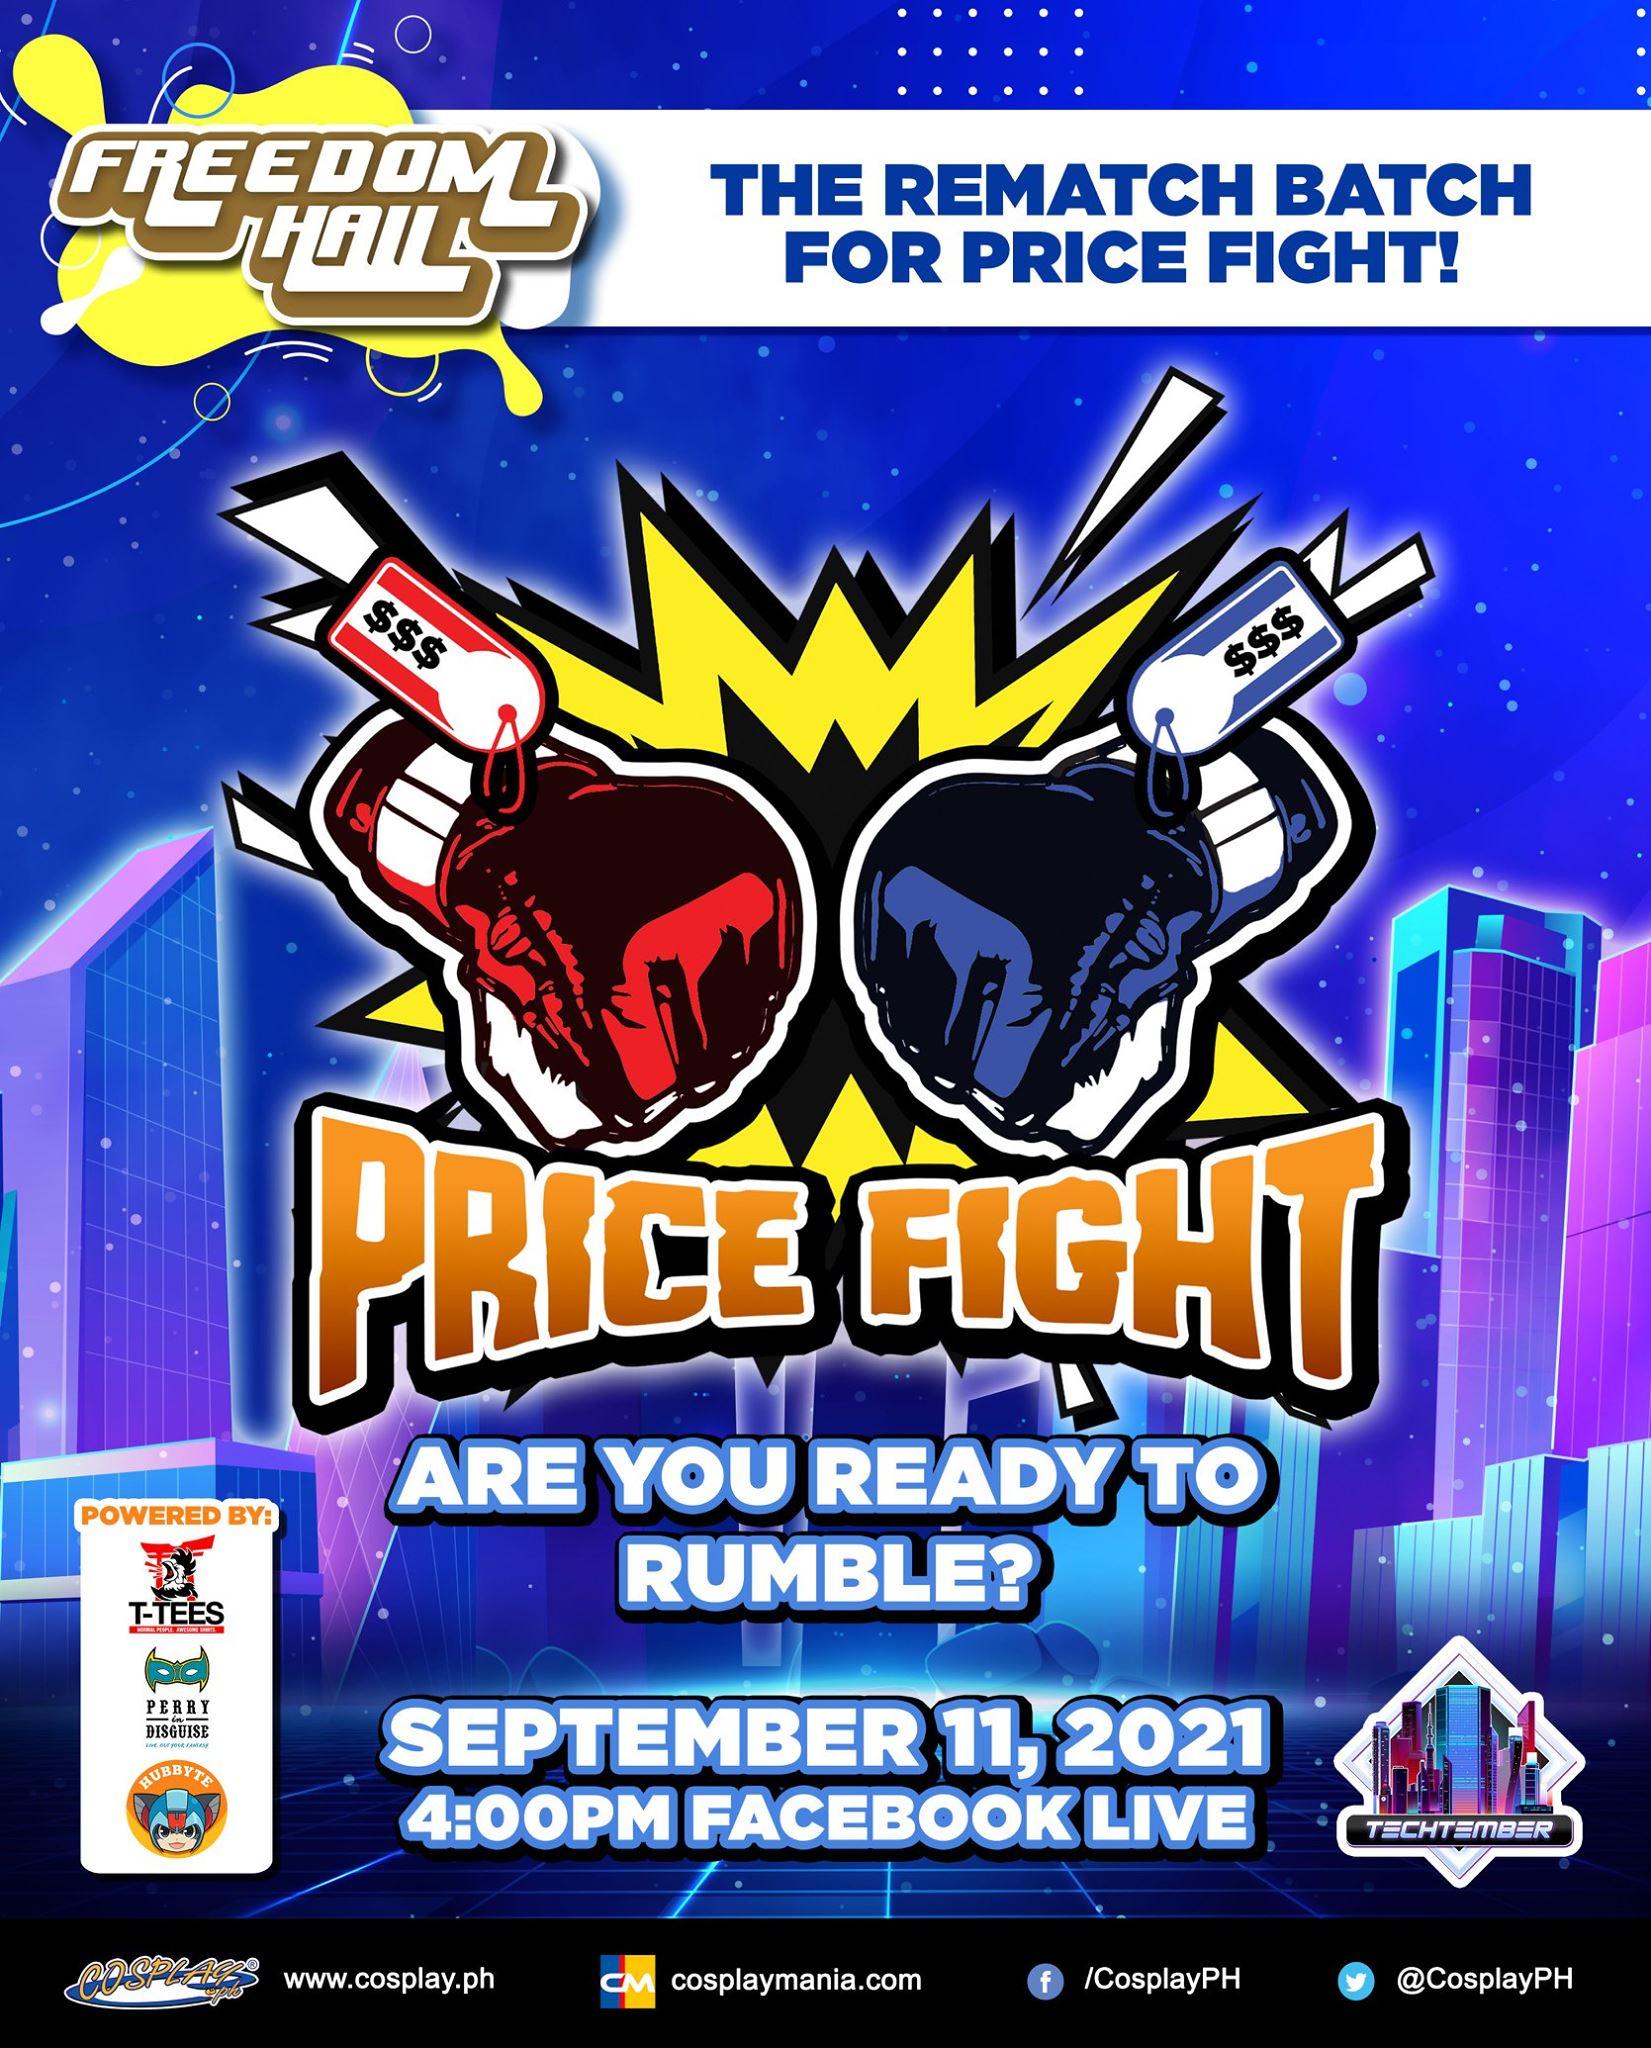 Price Fight Rematch